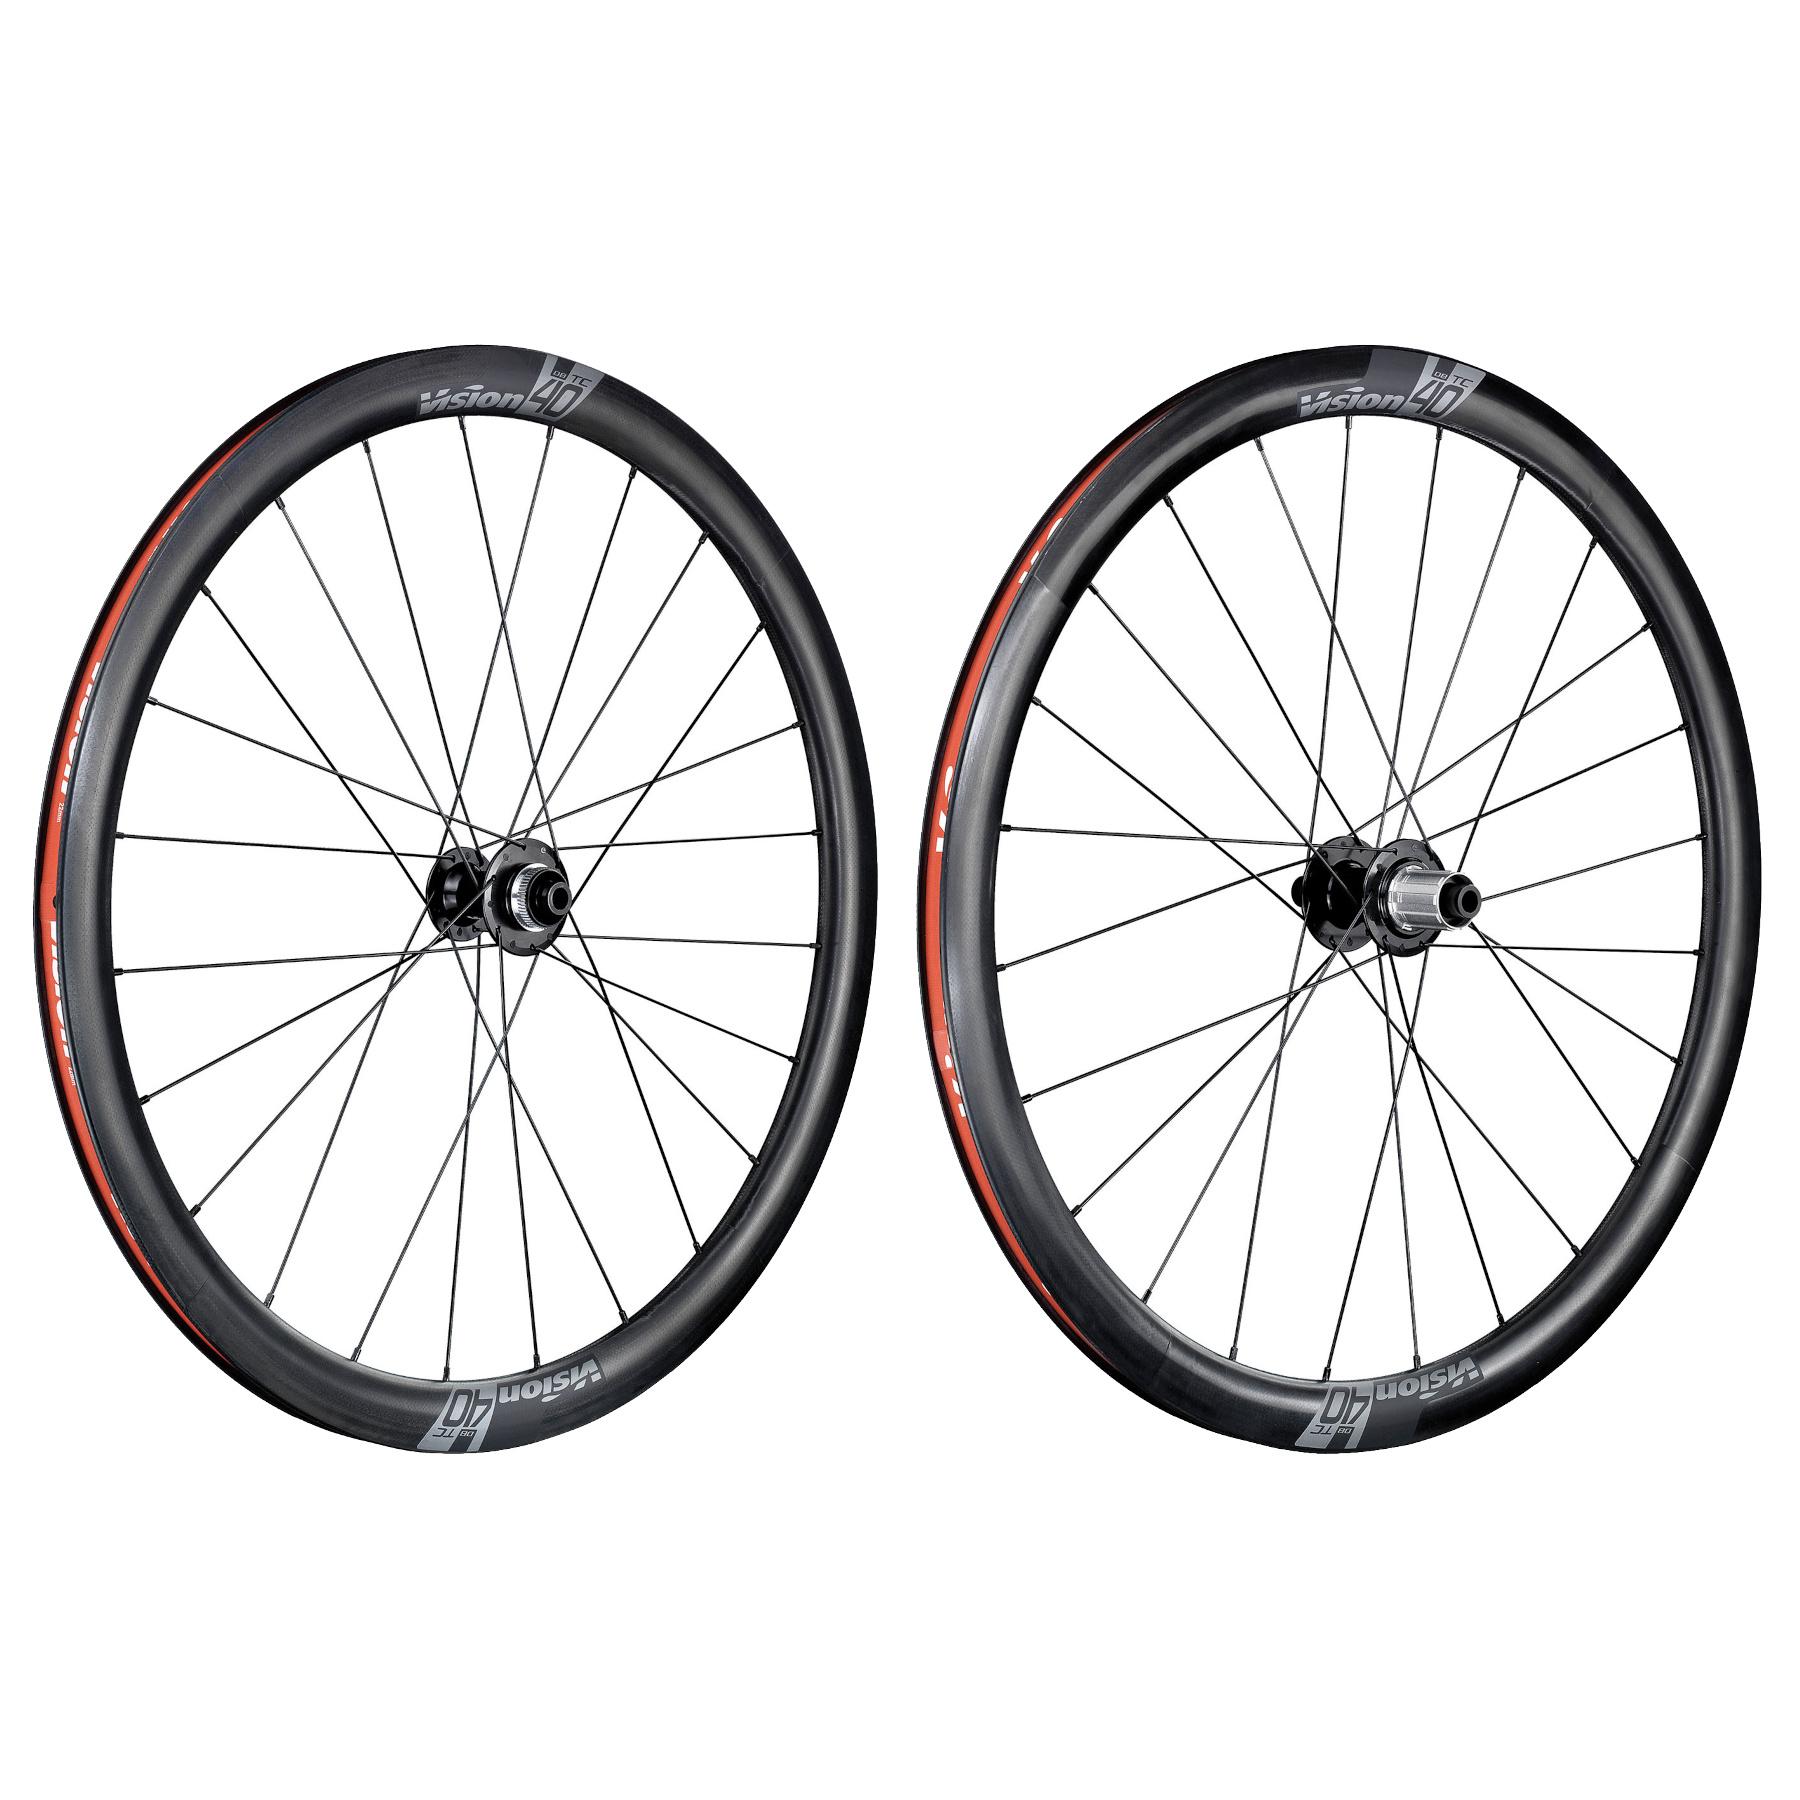 Vision TC 40 Disc Carbon Laufradsatz - TLR - Centerlock - 12x100mm | 12x142mm - Shimano HG